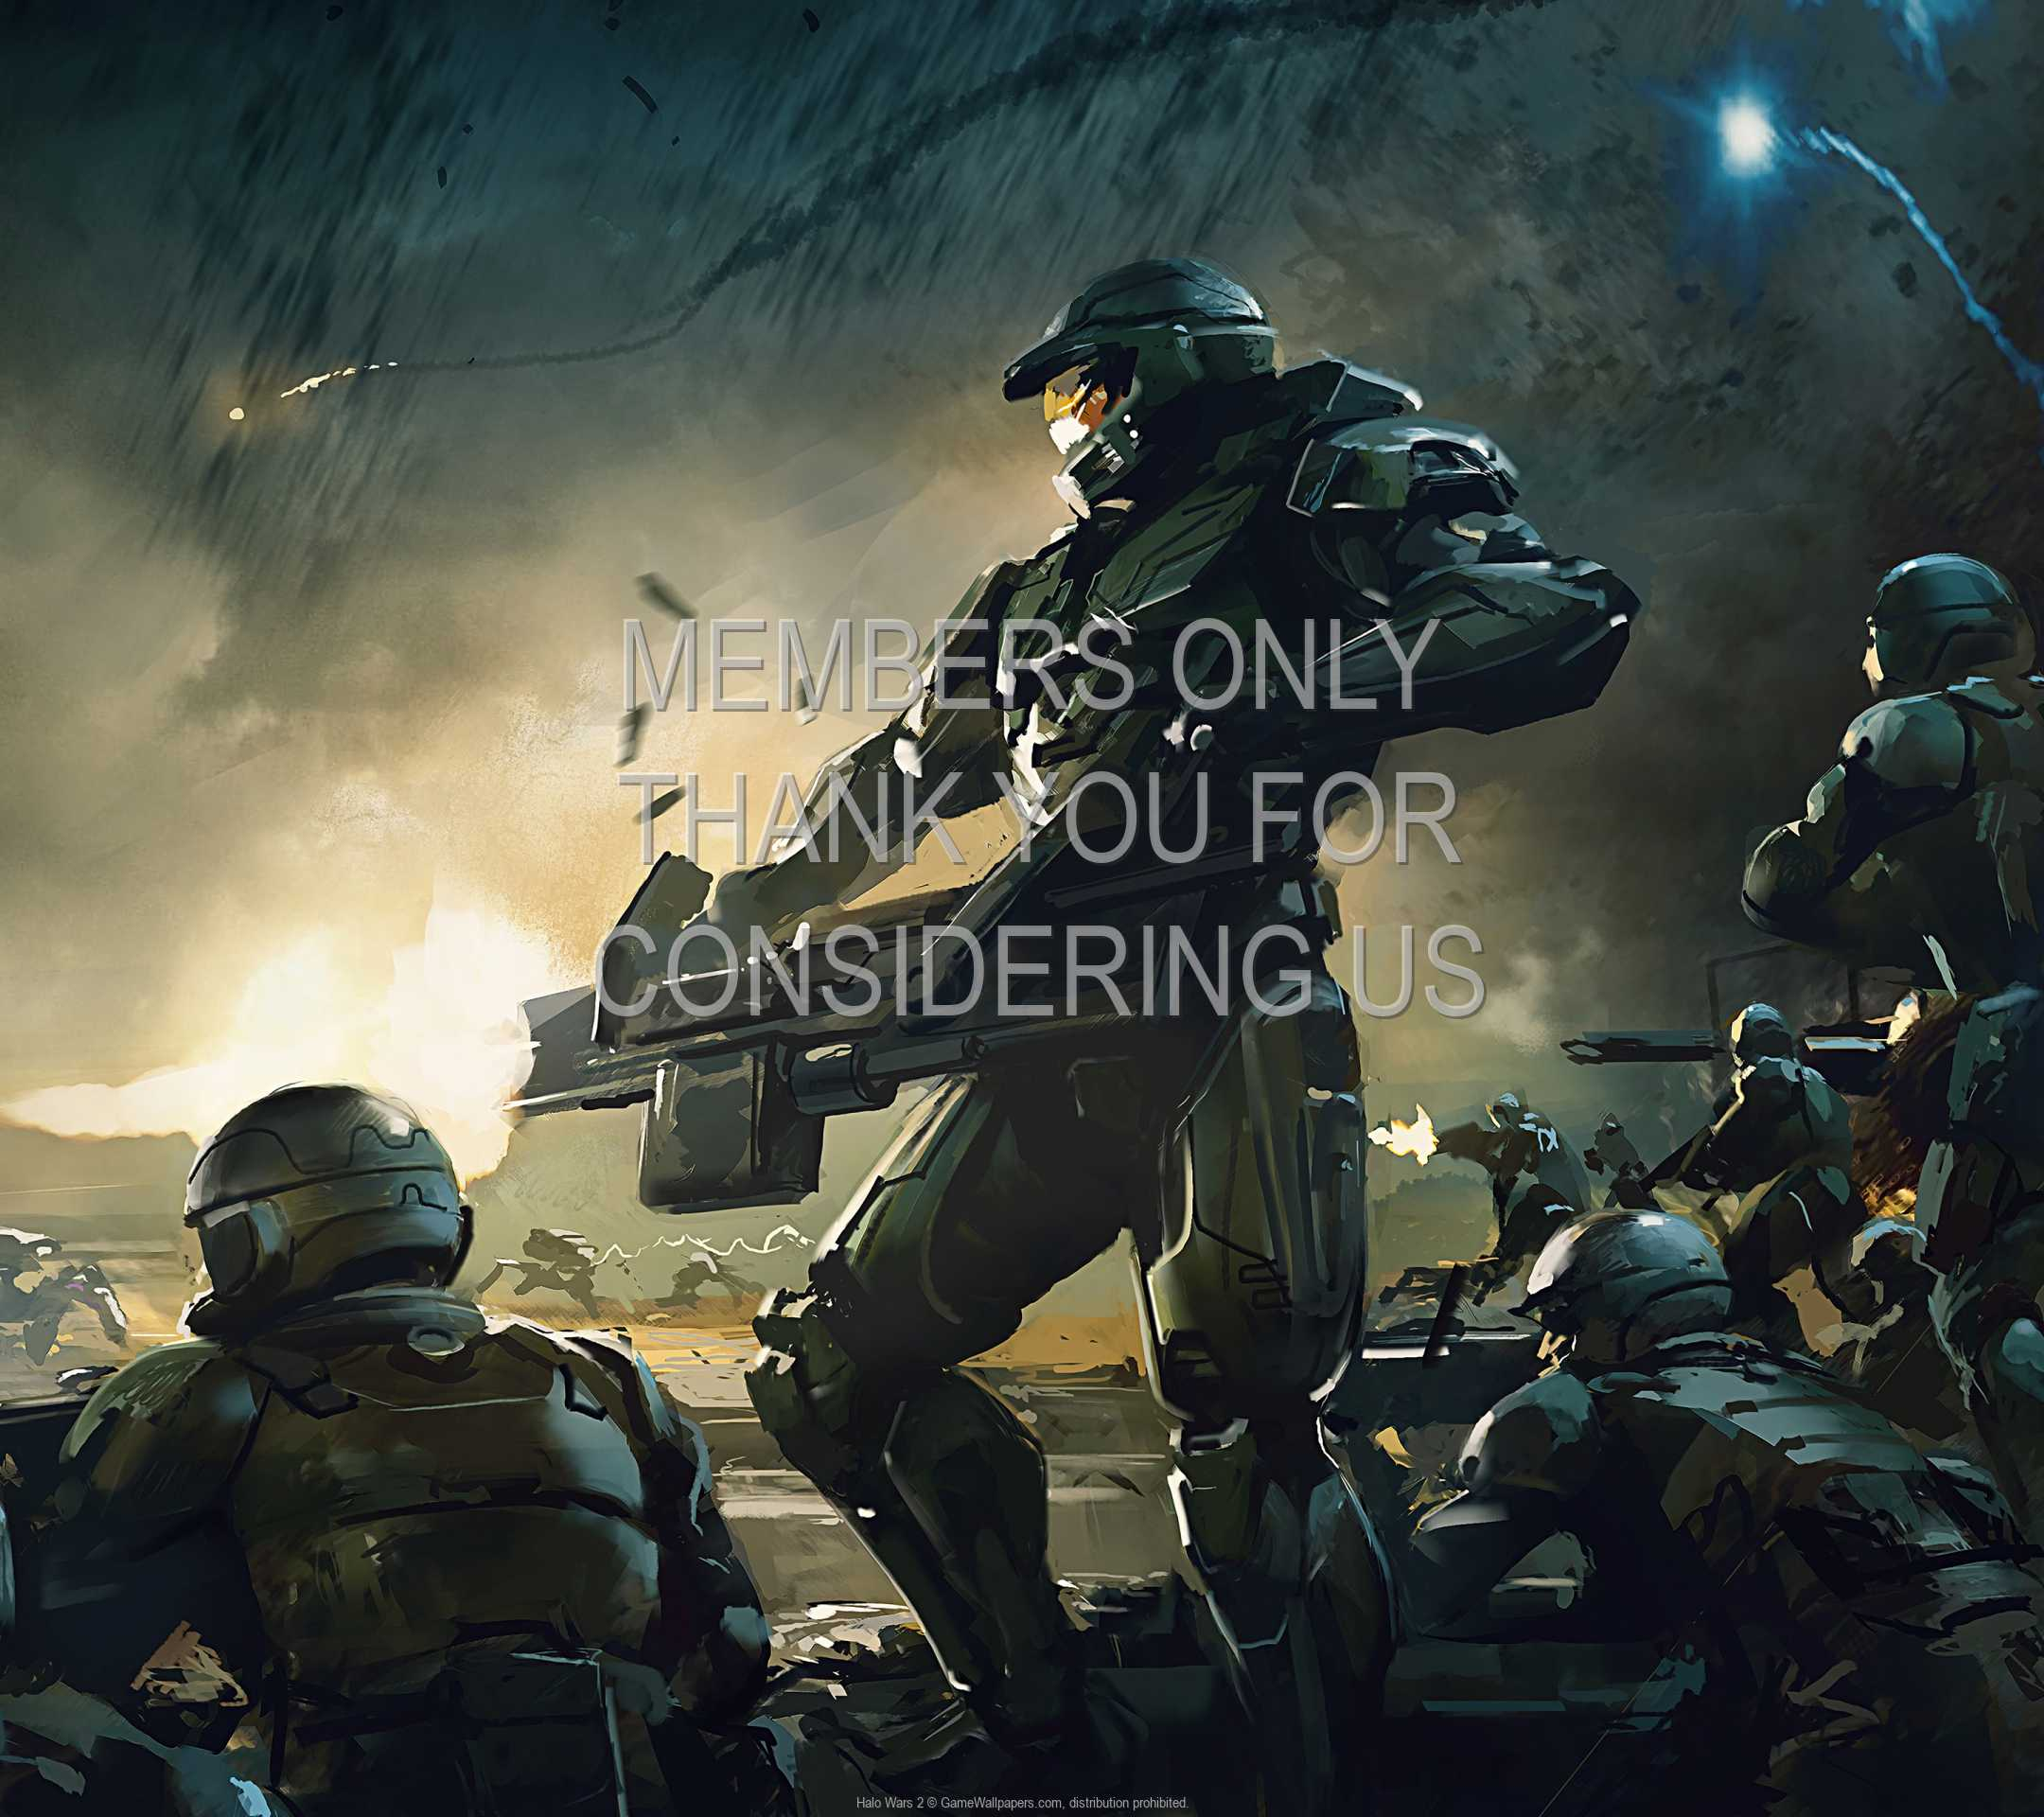 Halo Wars 2 1080p Horizontal Mobile wallpaper or background 03